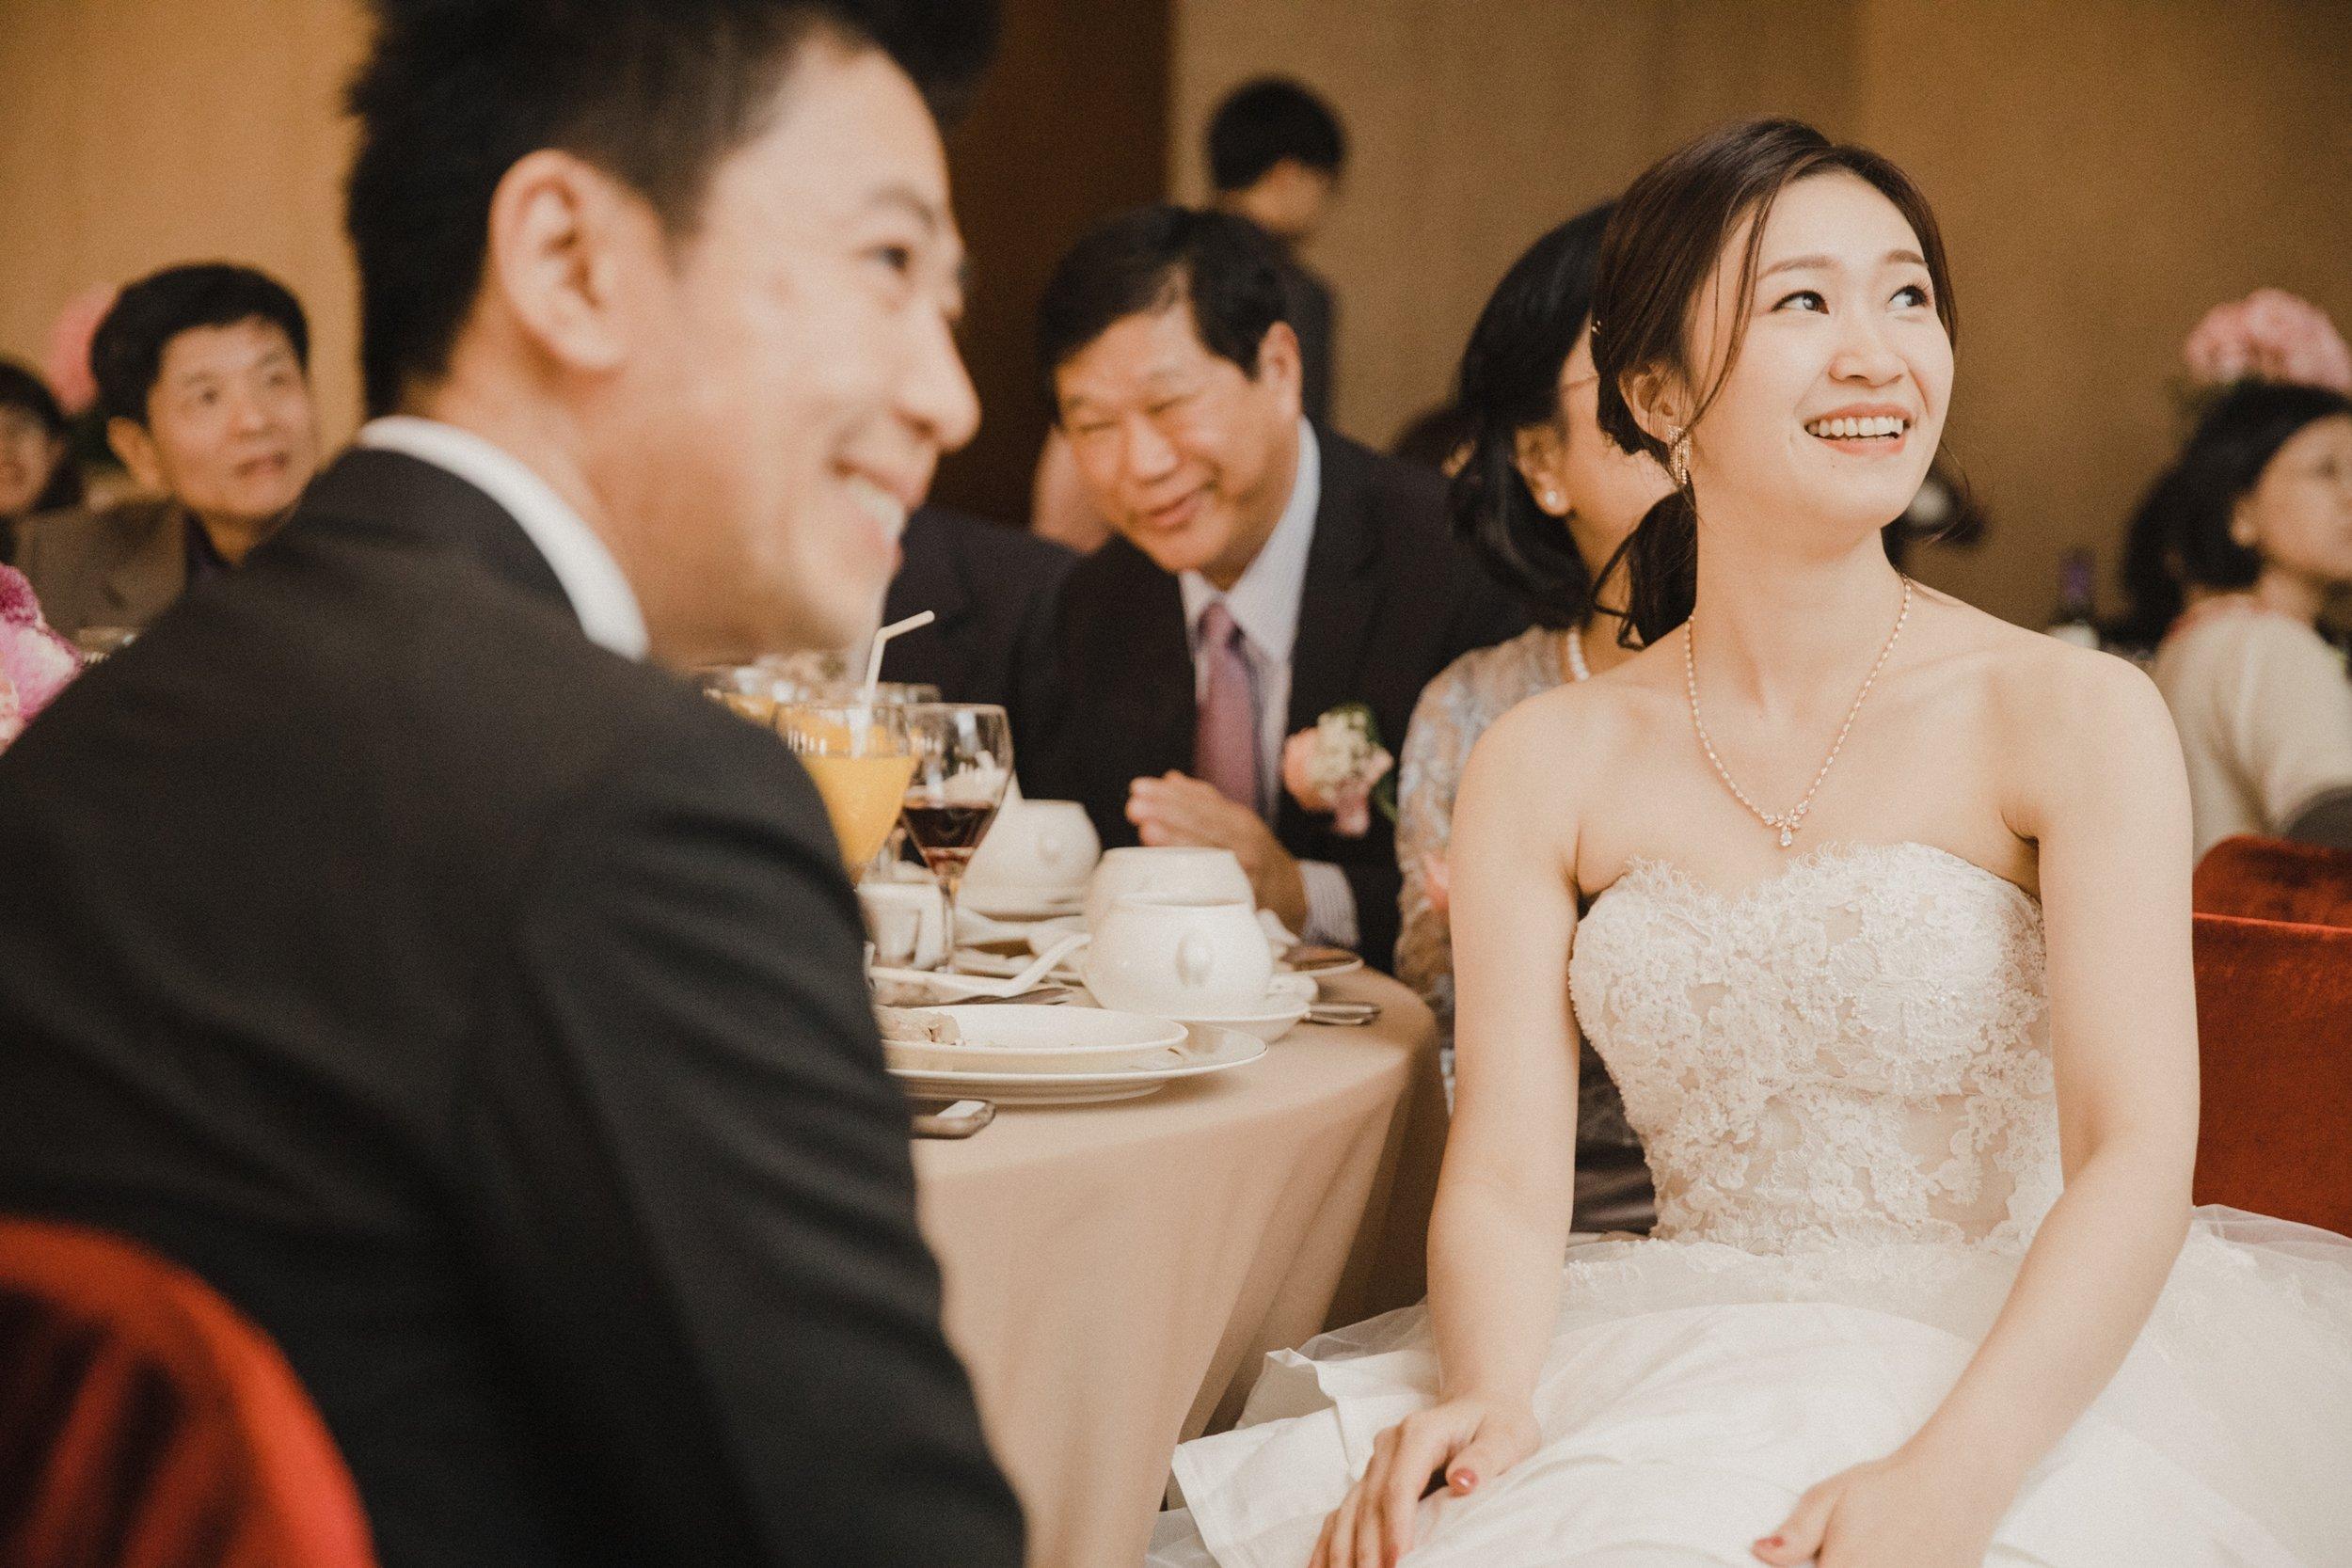 wedding-caridee-oscar-lunch-ambassador-hsinchu-結婚午宴-新竹國賓_94.jpg